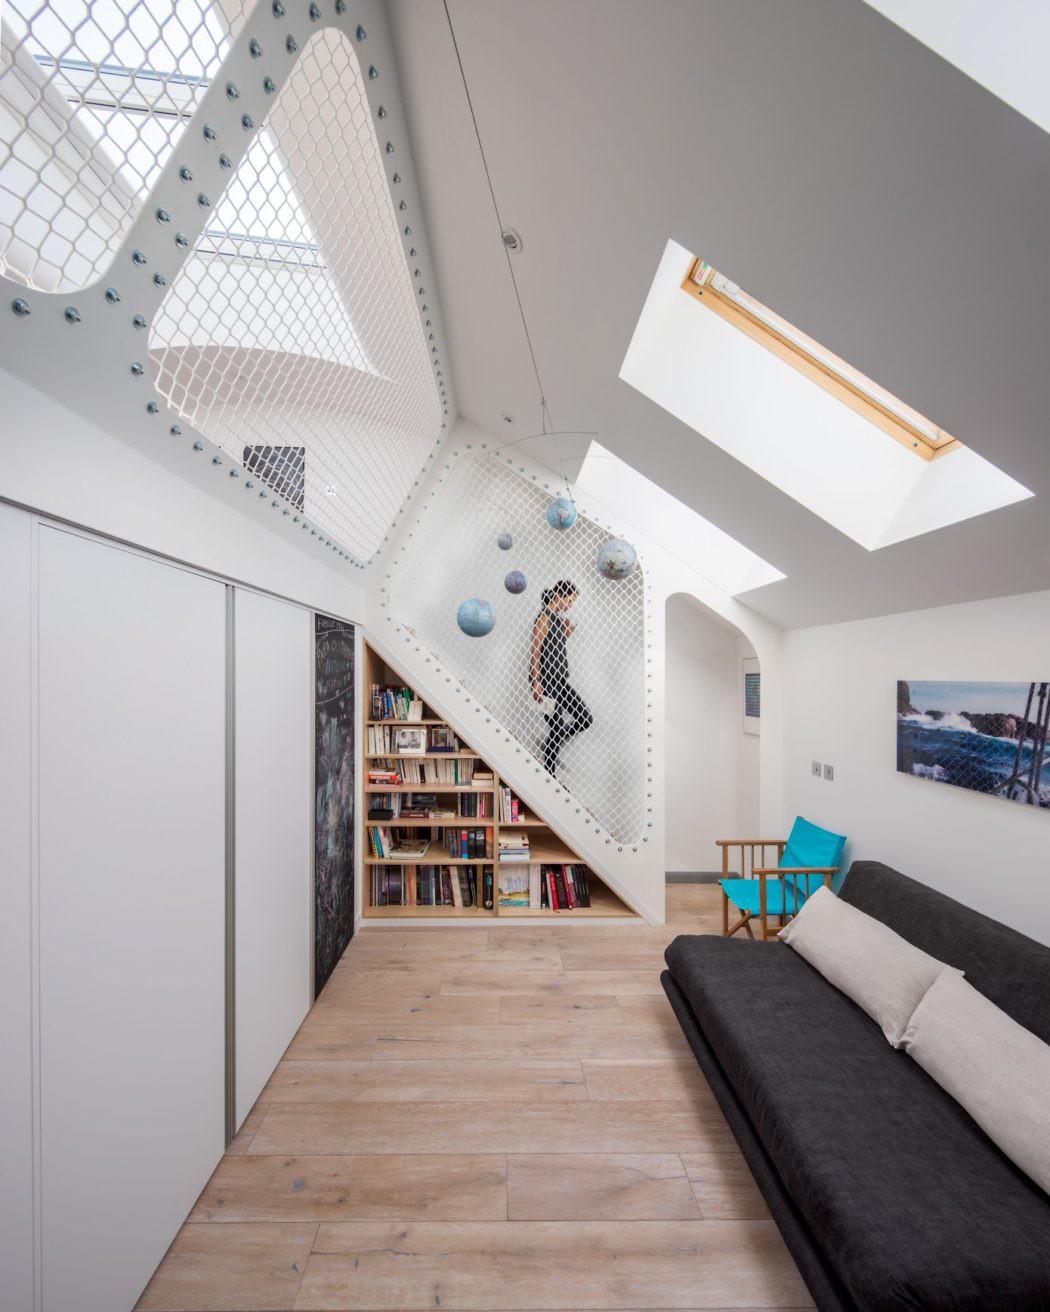 The Nook by Scenario Architecture